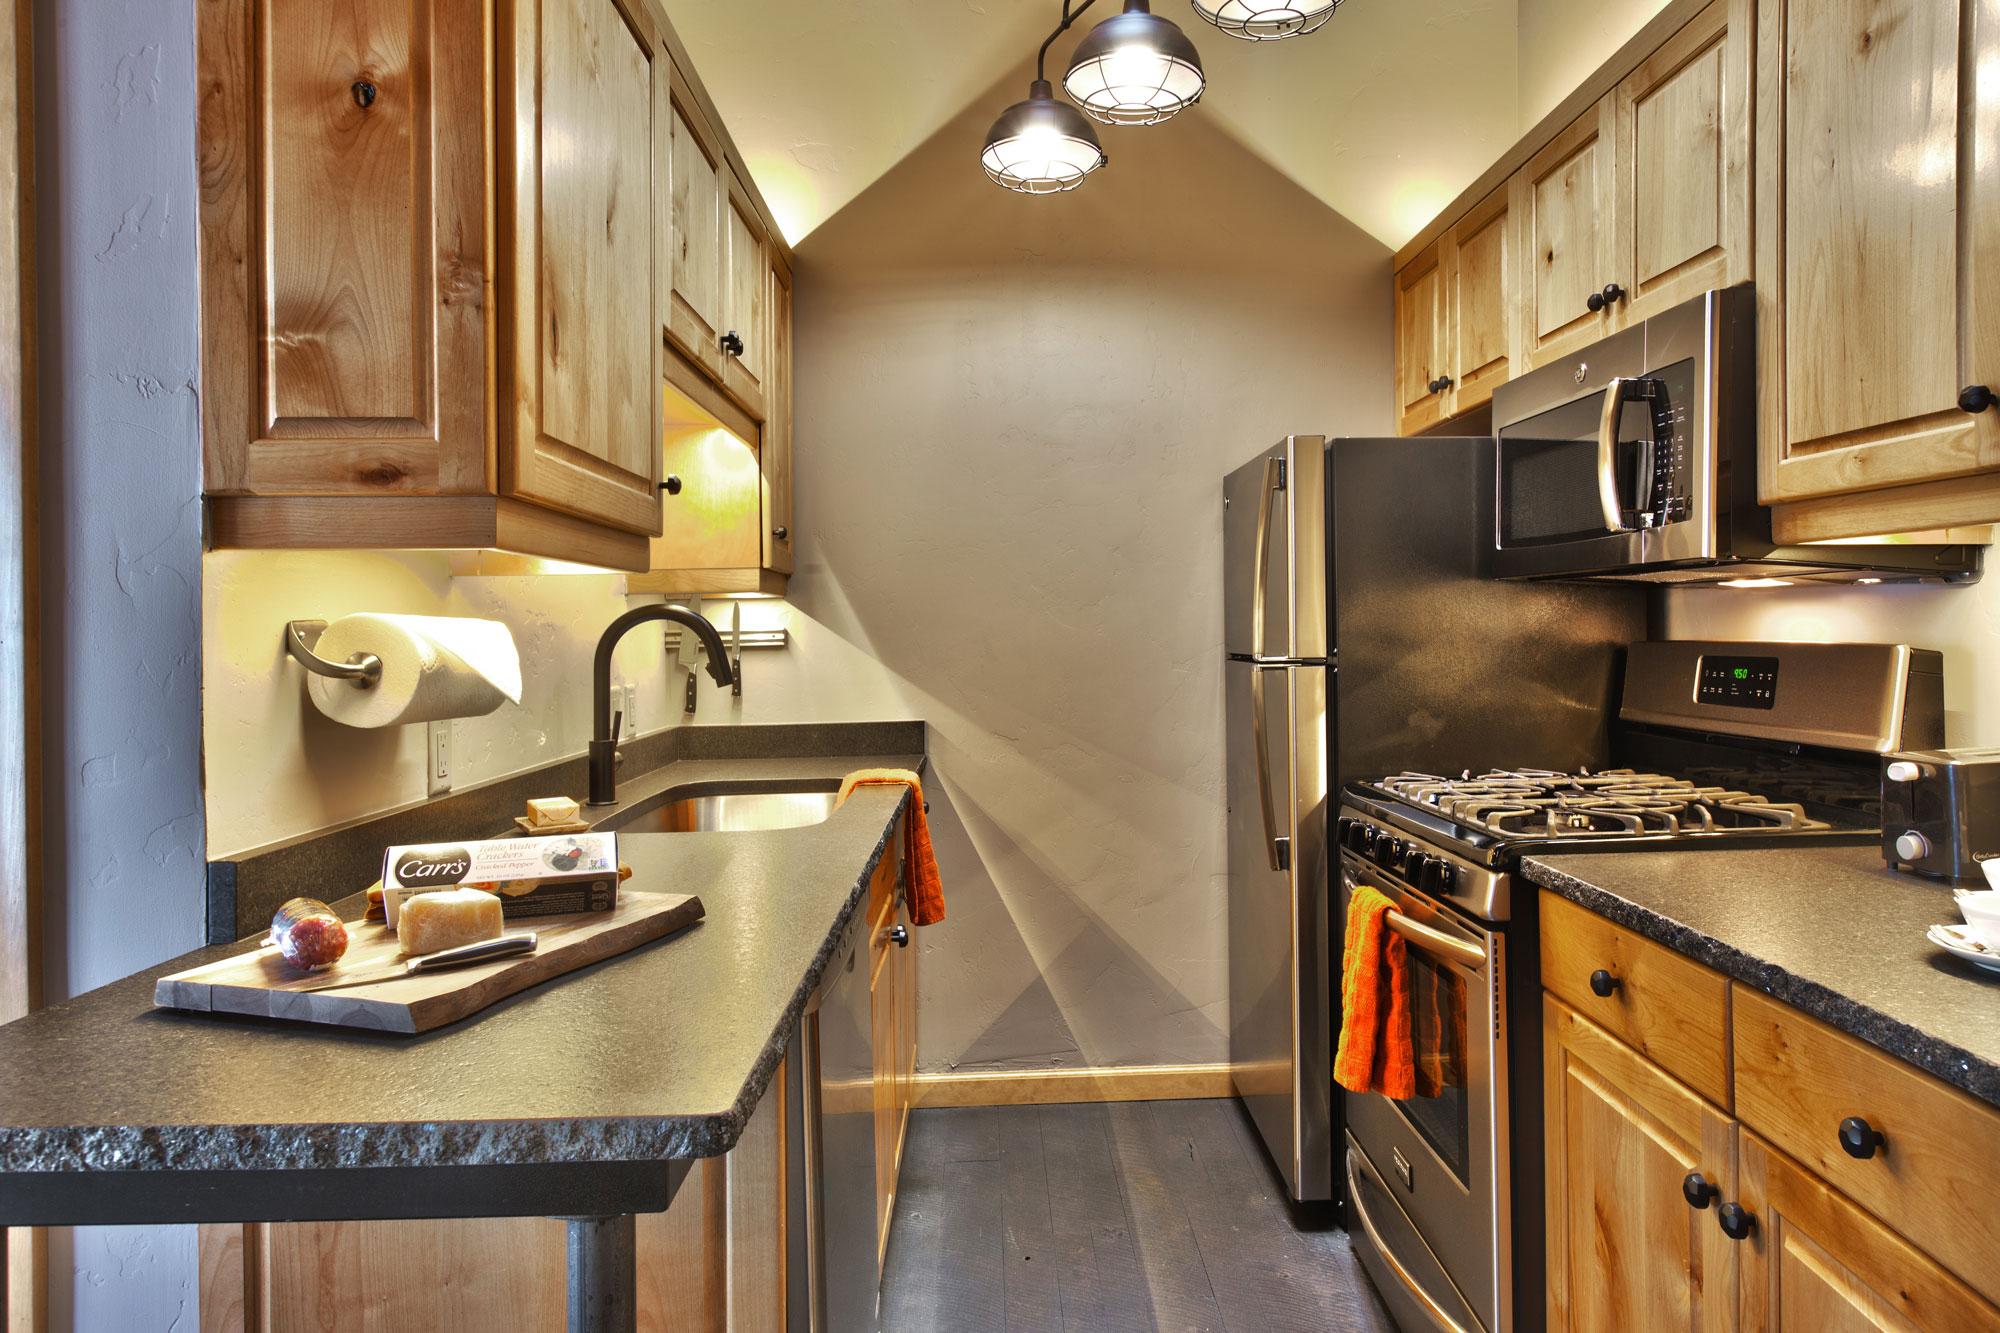 Heretic Condos Park City Unit 2, 2 Bedroom, 2 Bath, Kitchen